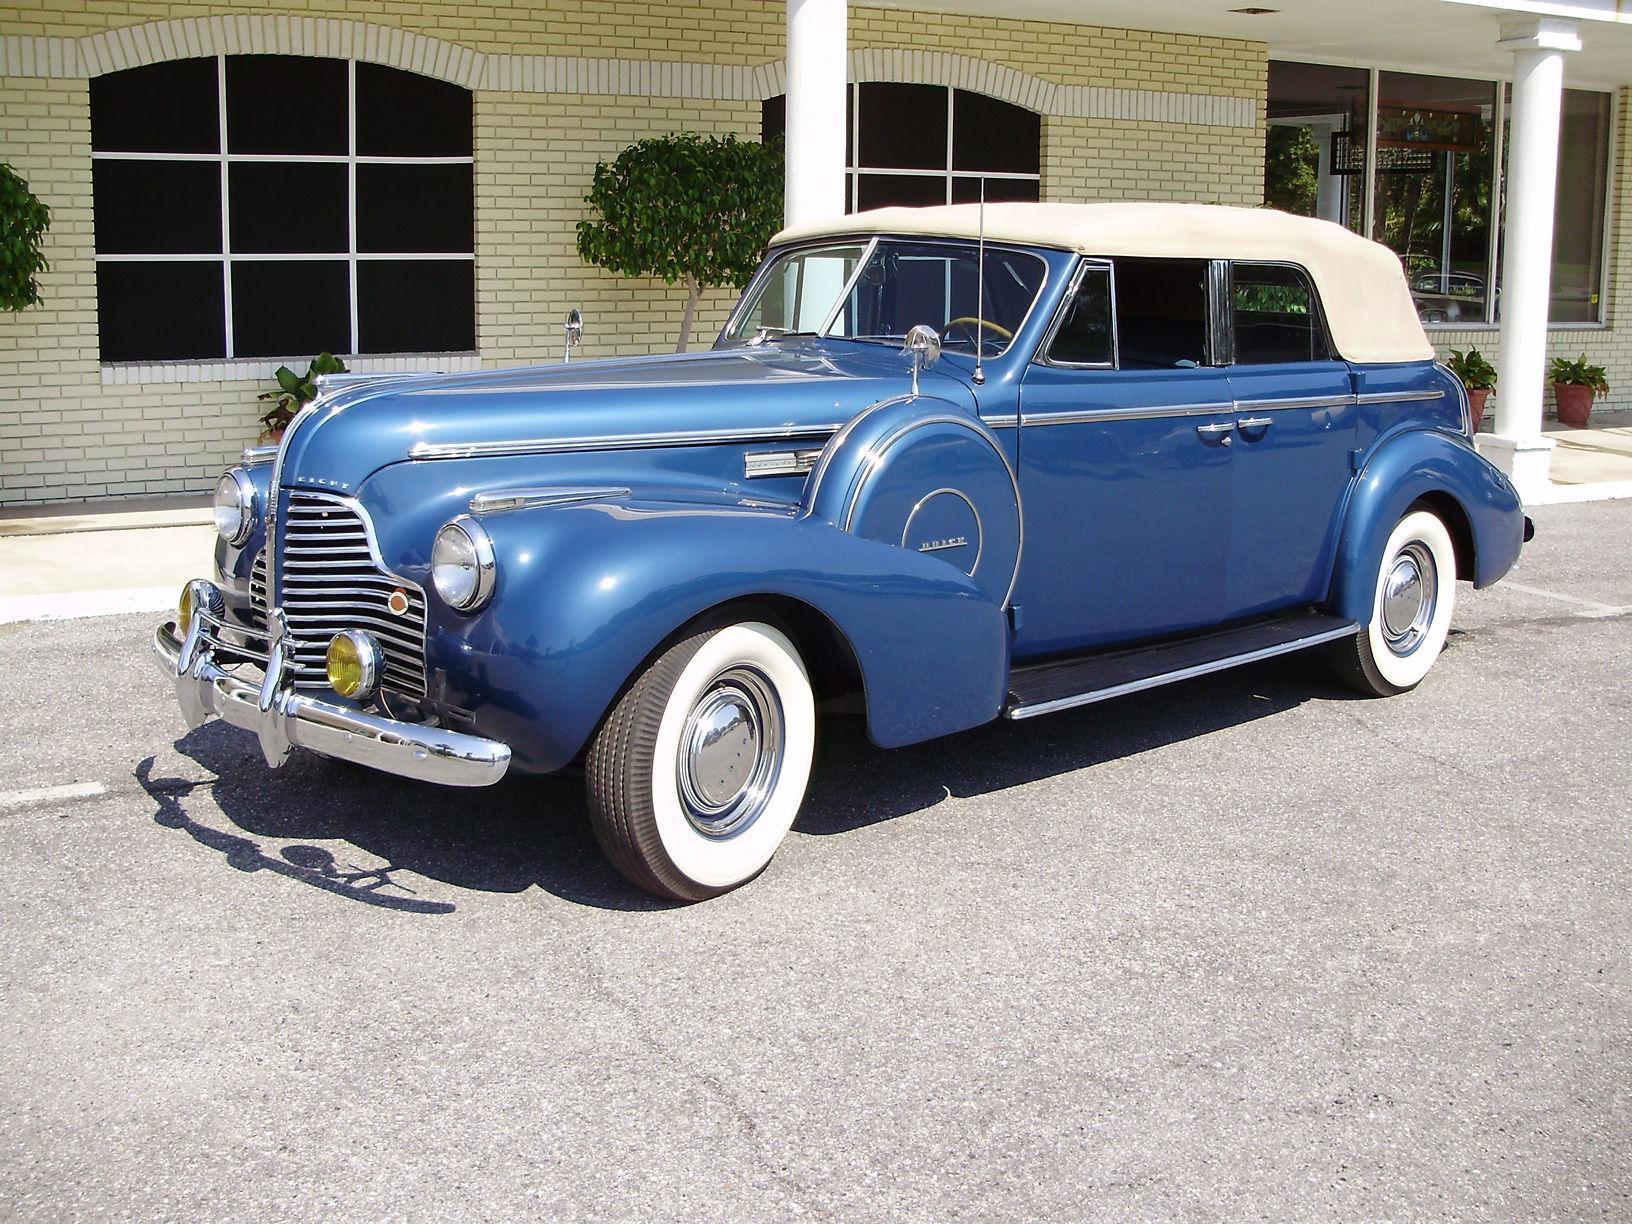 1940 BUICK CENTURY CONVERTIBLE SEDAN - Vintage Motors of Sarasota Inc. #13